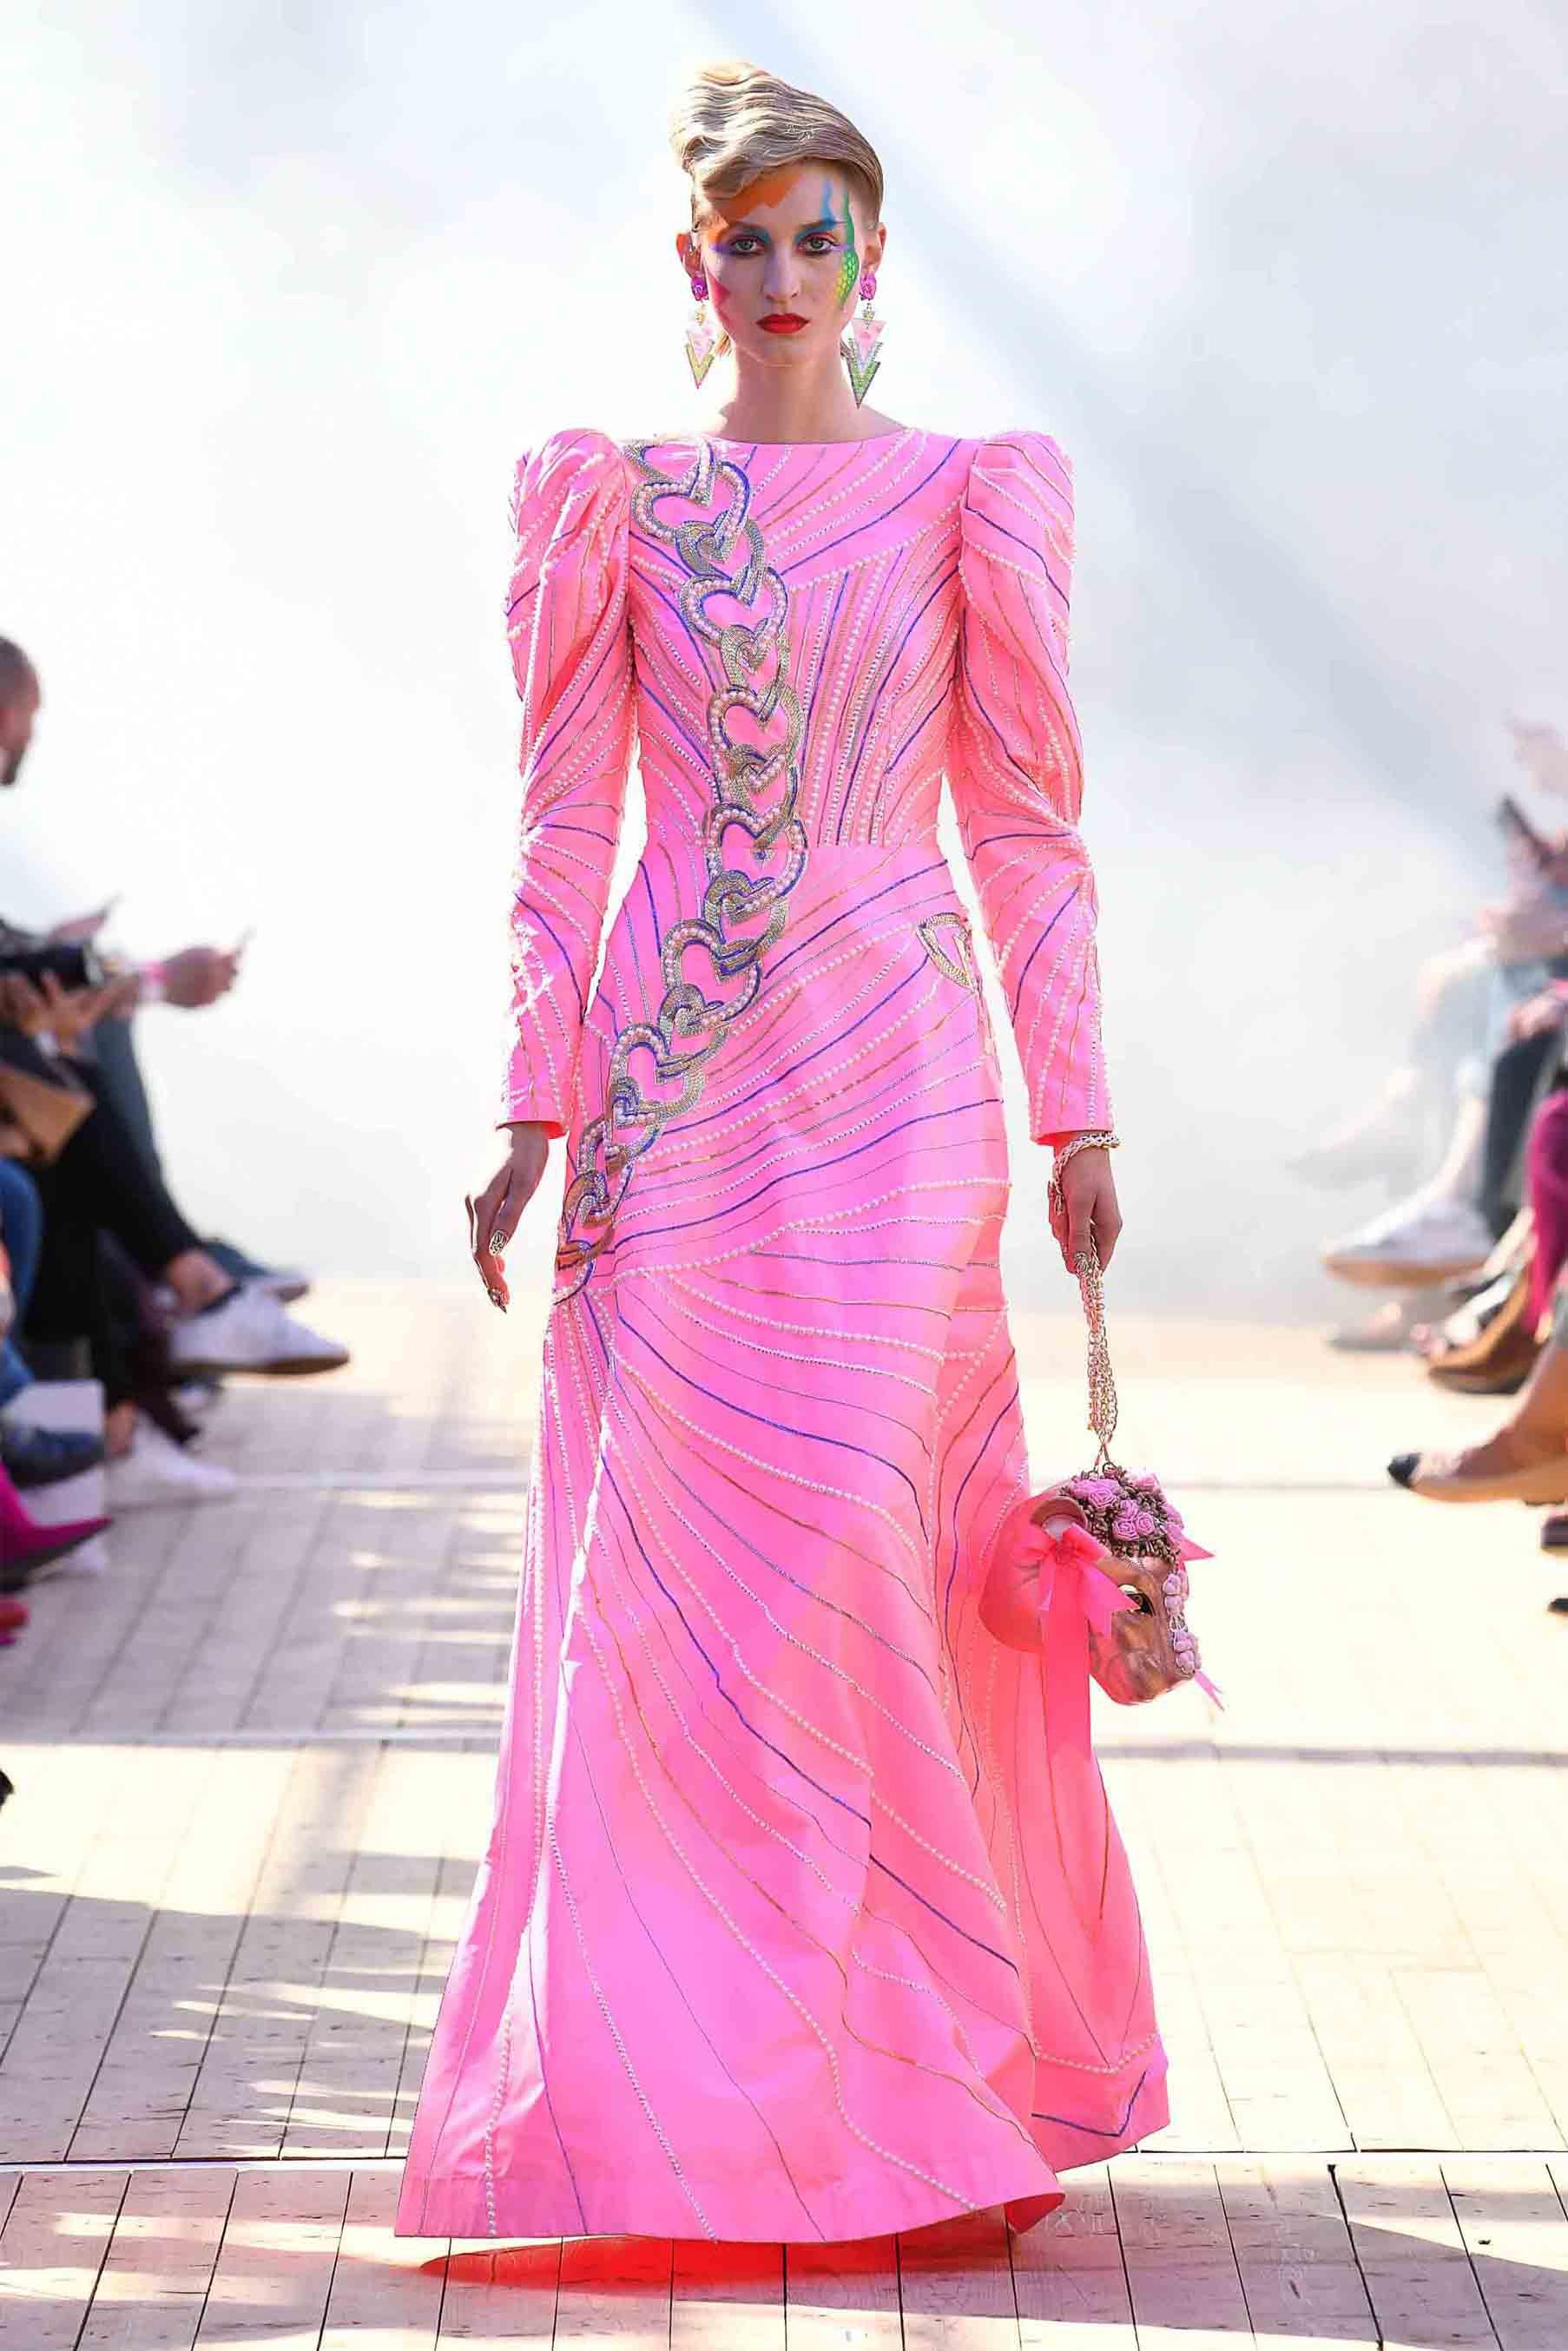 Fashion, Featured, Kanelle, Kanika Jain, Manish Arora, New York Fashion Week 2019, Online Exclusive, Paris Fashion Week 2019, Rahul Mishra, Ready-To-Wear Spring 2019, Spring/Summer 2019, Style